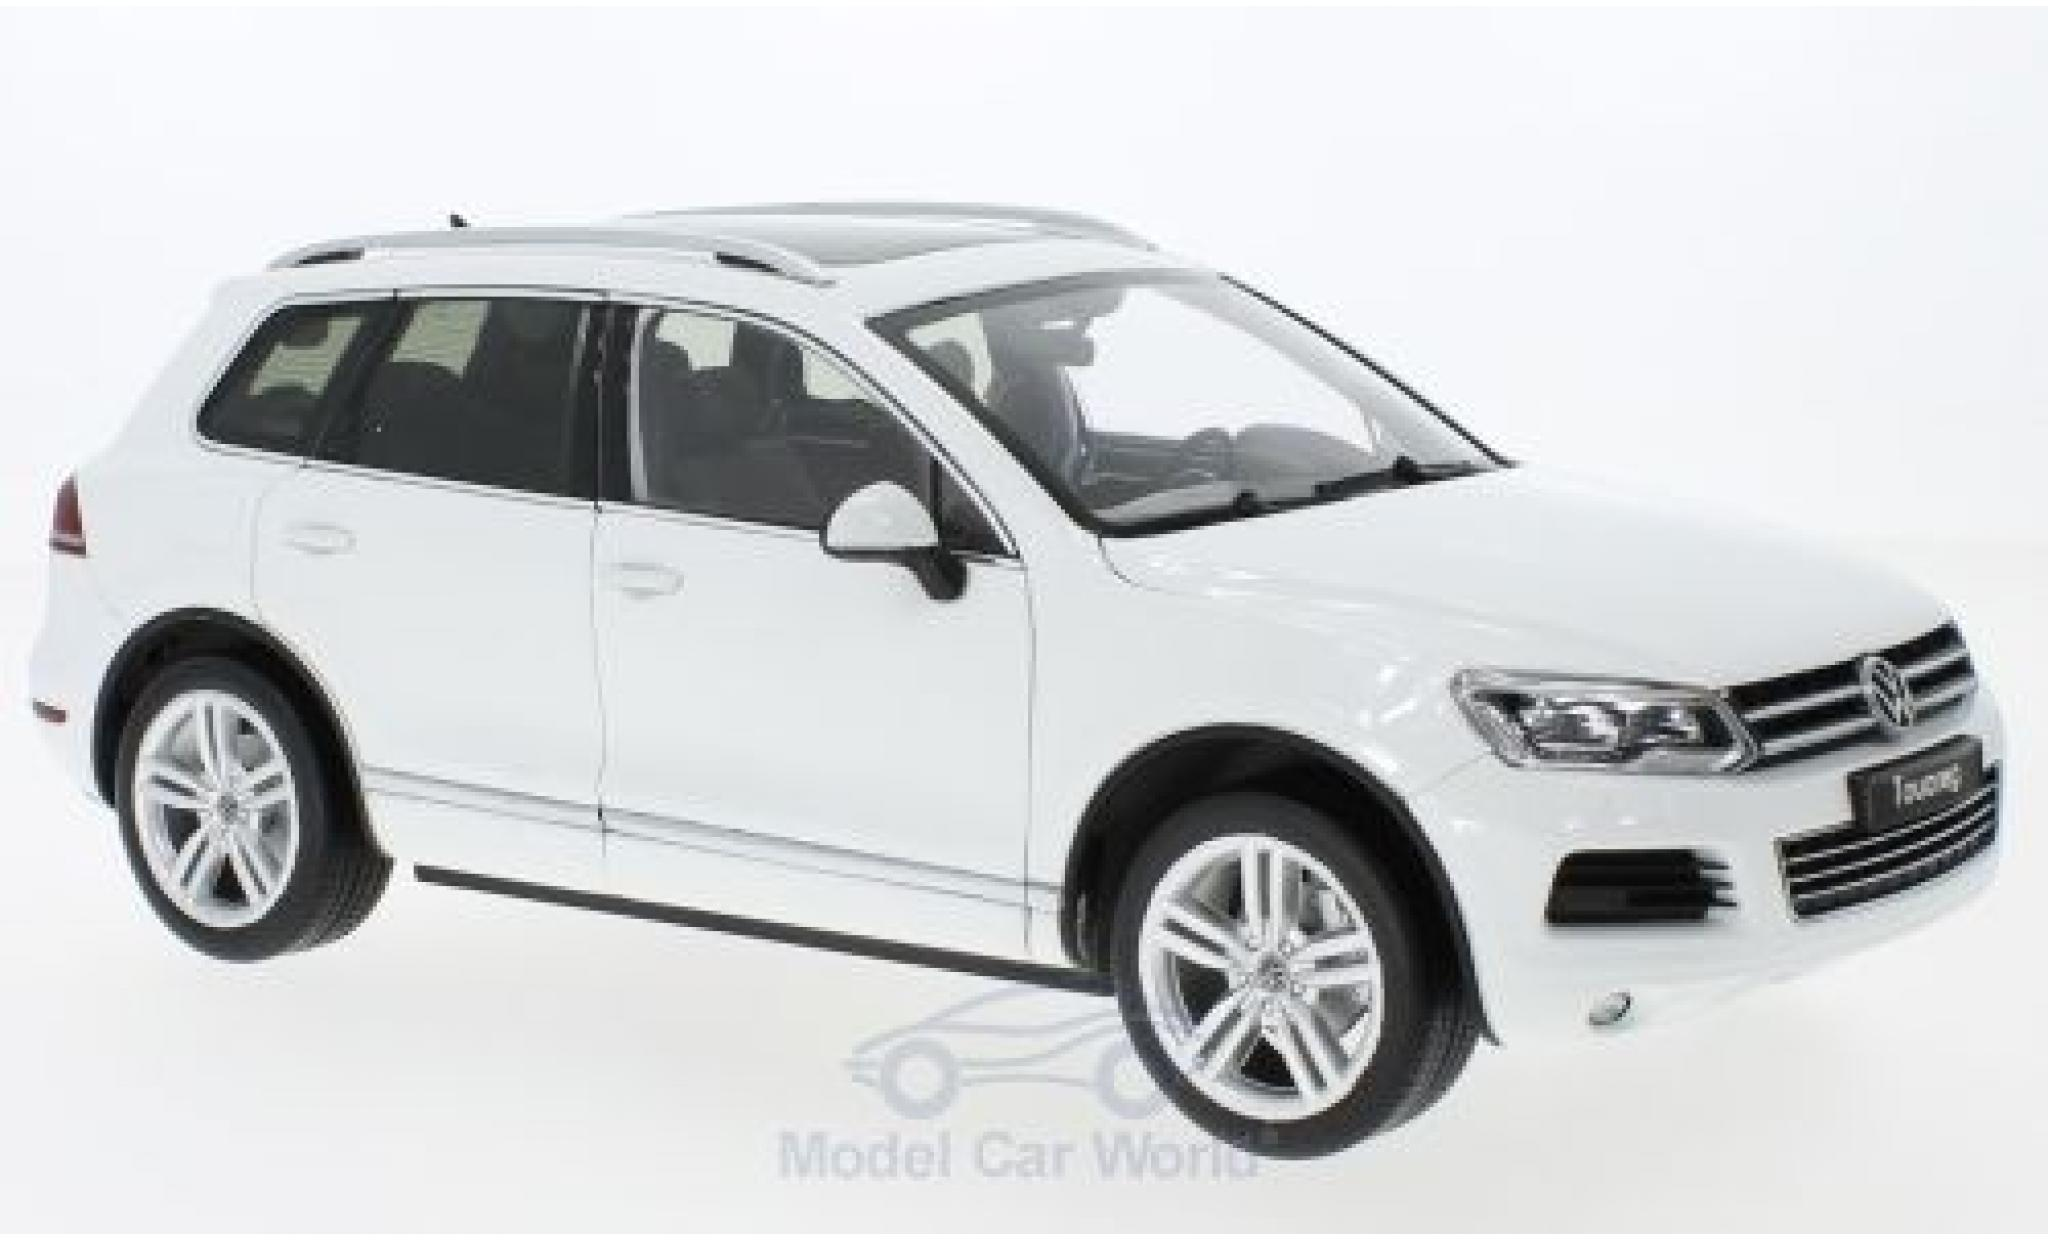 Volkswagen Touareg 1/18 Welly II white GTA Edition